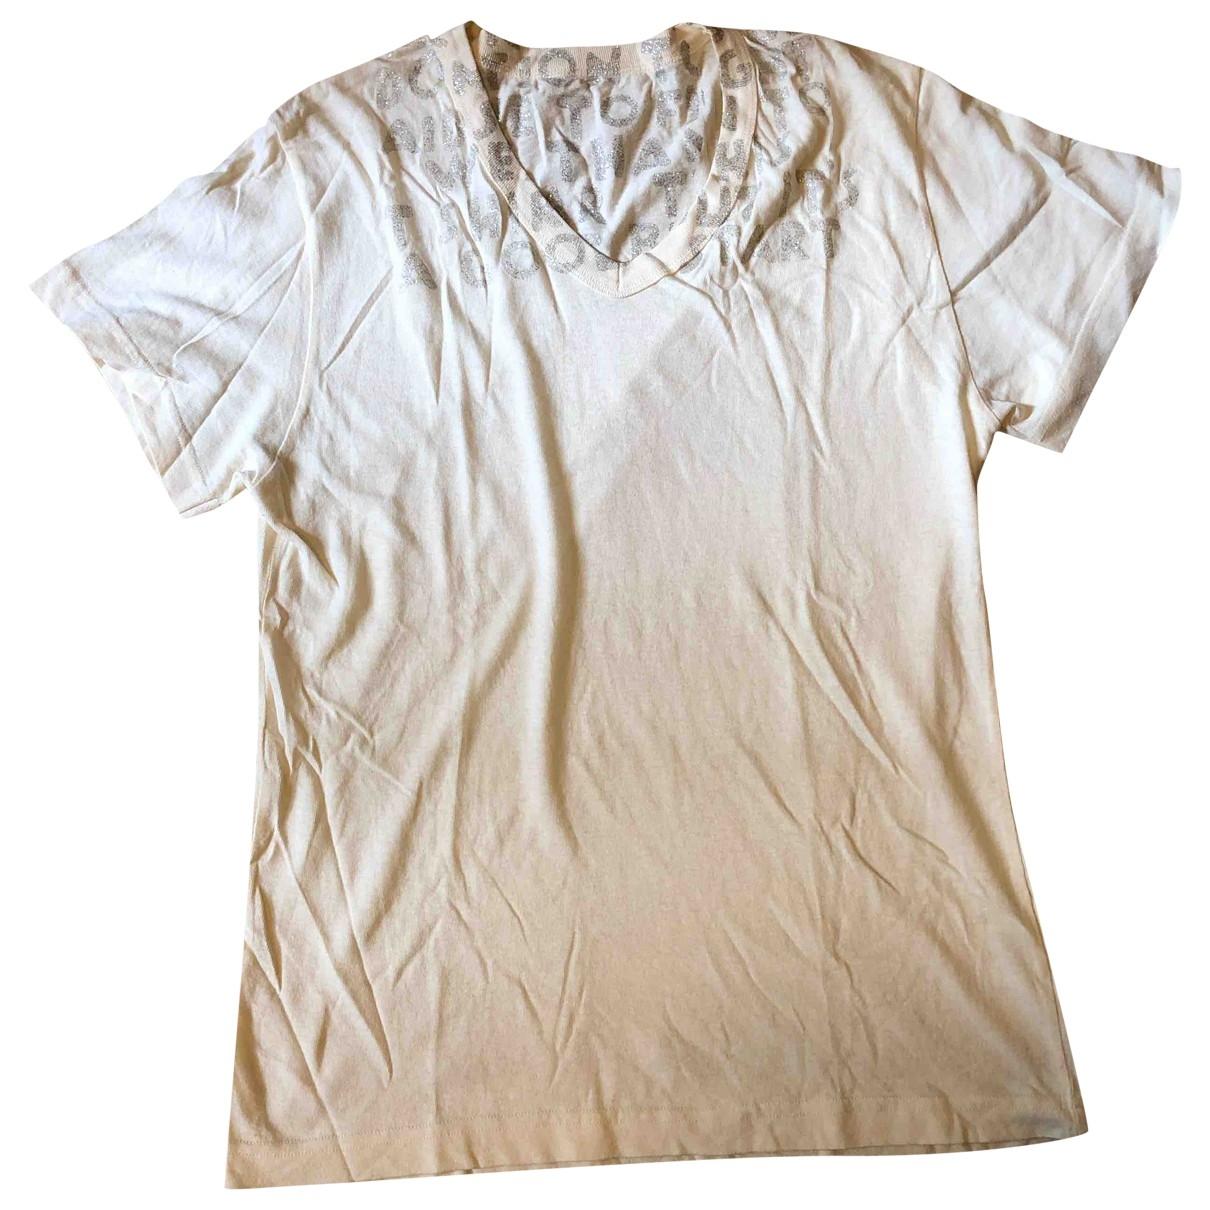 Maison Martin Margiela \N Beige Cotton T-shirts for Men S International